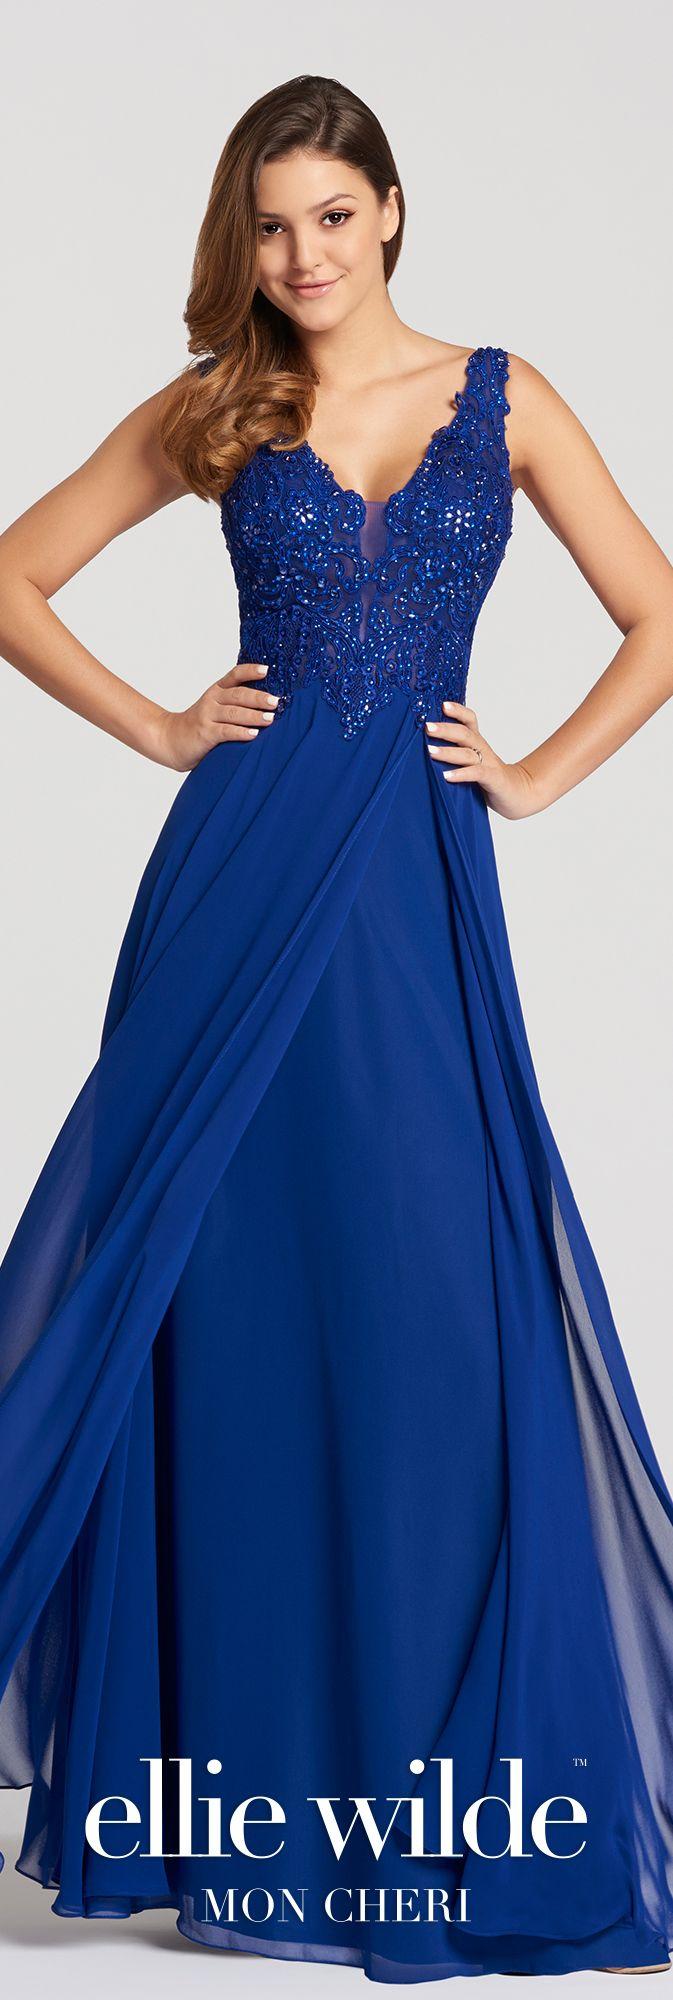 Royal blue lace dress styles  Chiffon u Lace ALine Prom Dress with Plunging VNeckline EW